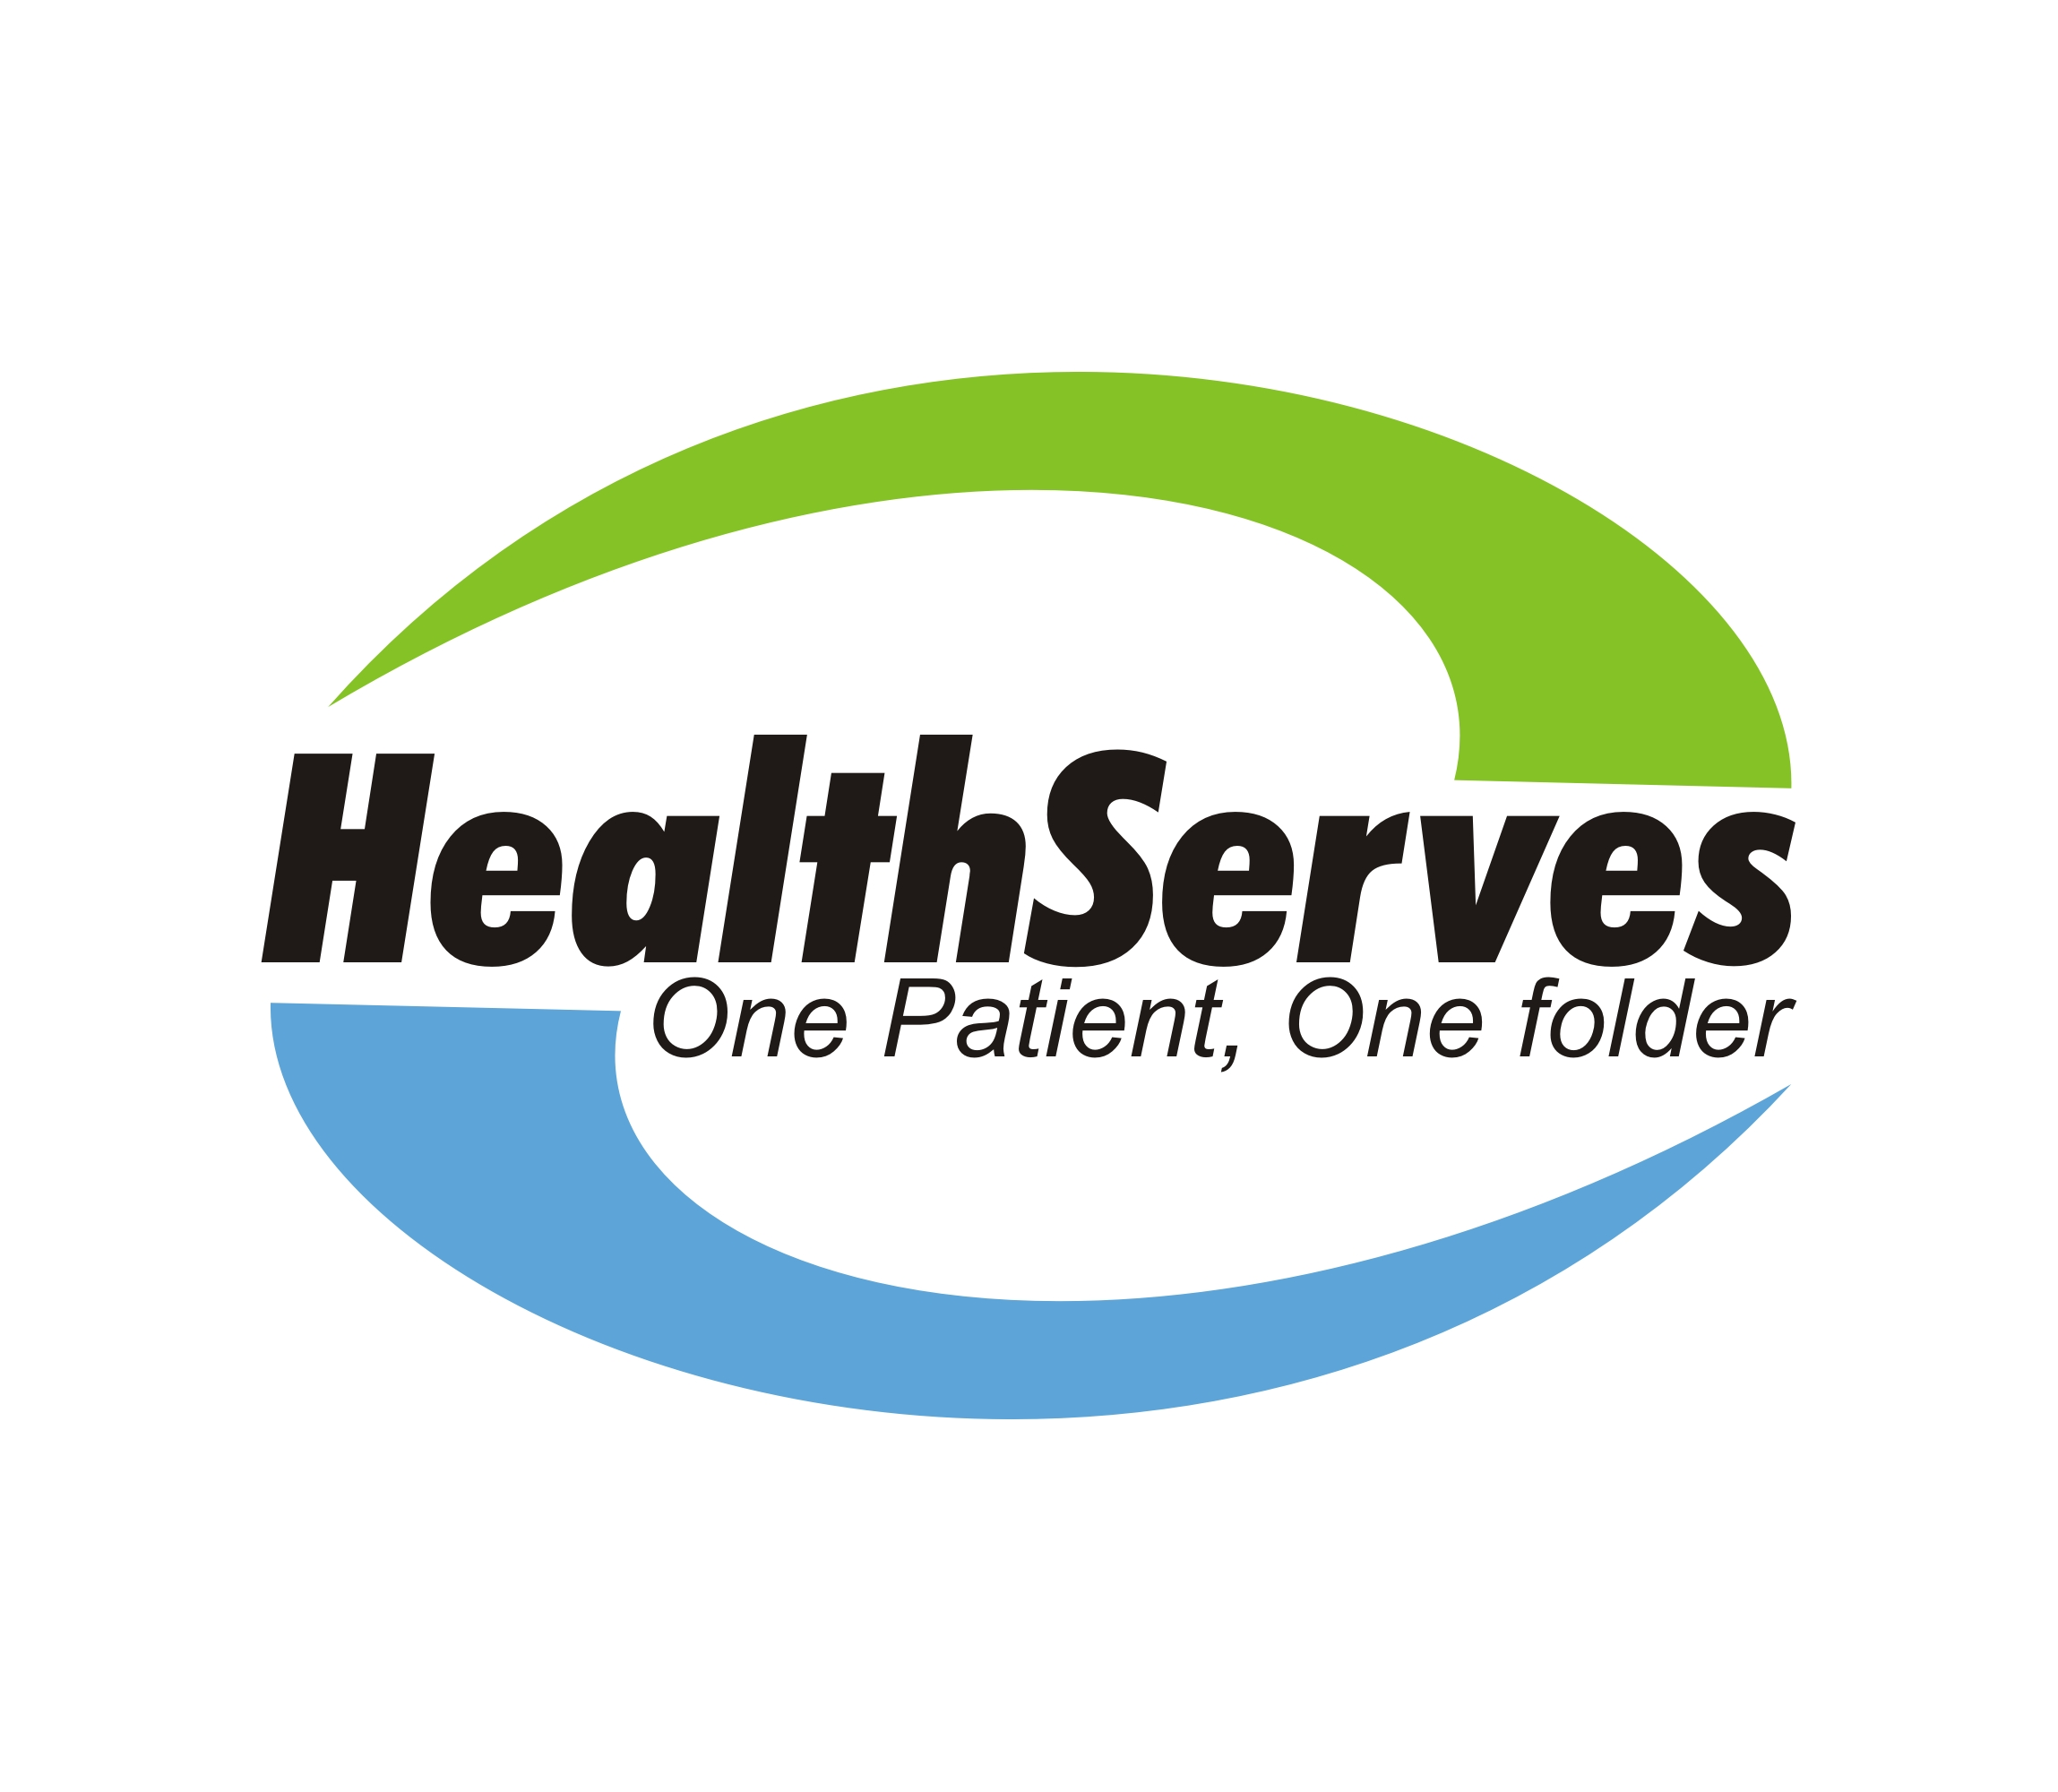 /srv/www/vhosts/user3101/html/entrepreneurship-campus.org/wp-content/uploads/2019/05/HealthServes-Logo-Copy-2.jpg